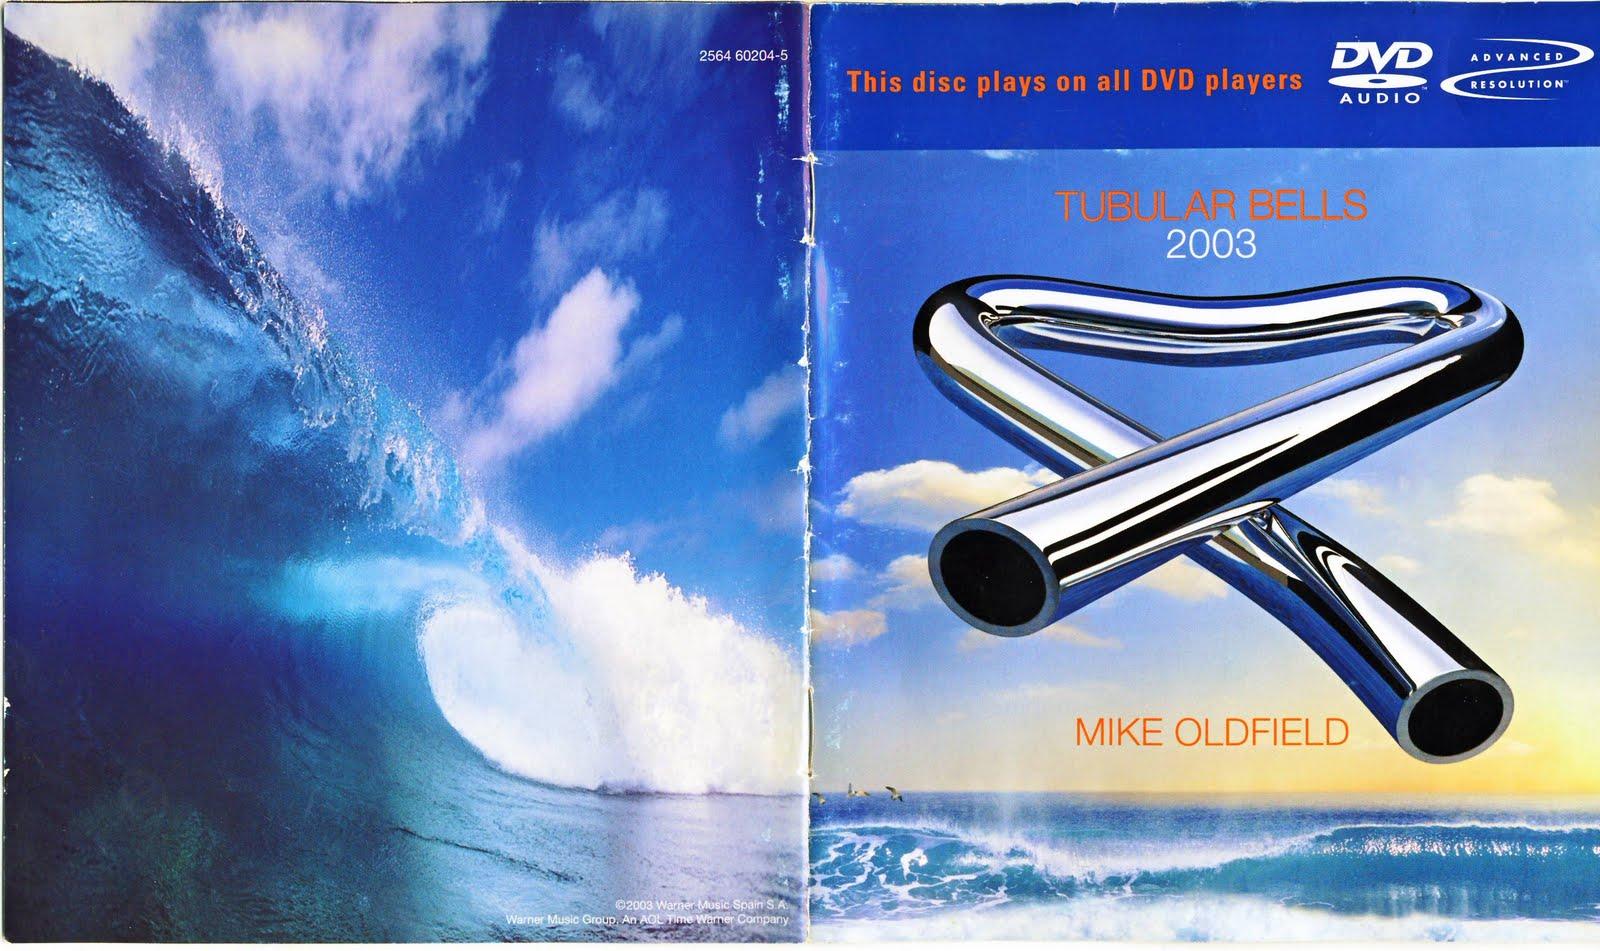 tubular bells 2003 dvd